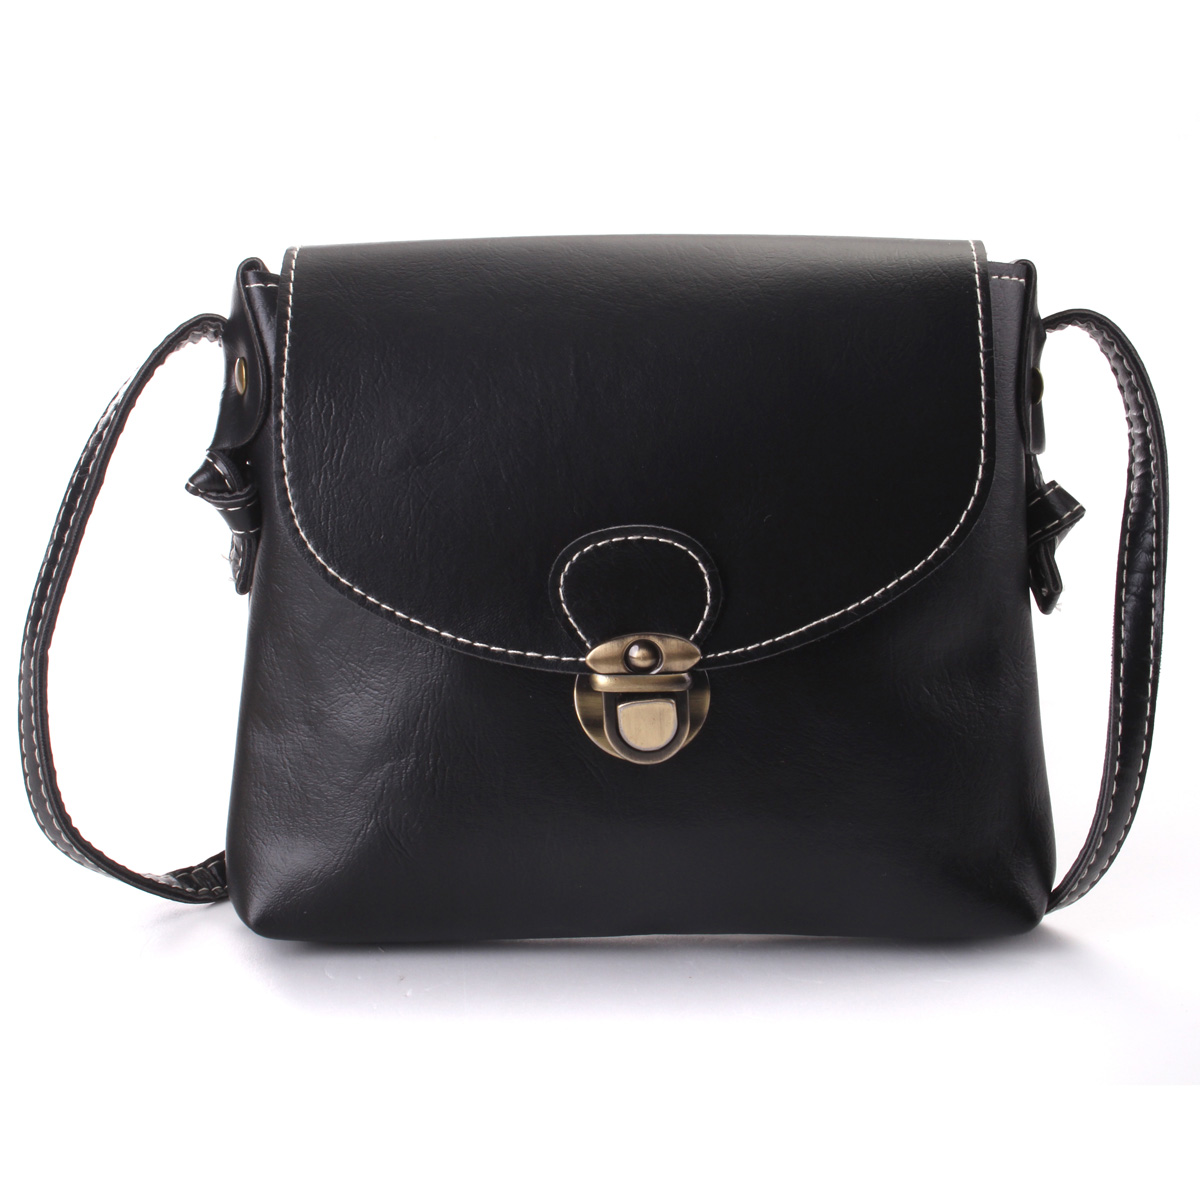 New Women PU Leather Shoulder Bag Crossbody Satchel Messenger Tote Purse Handbag